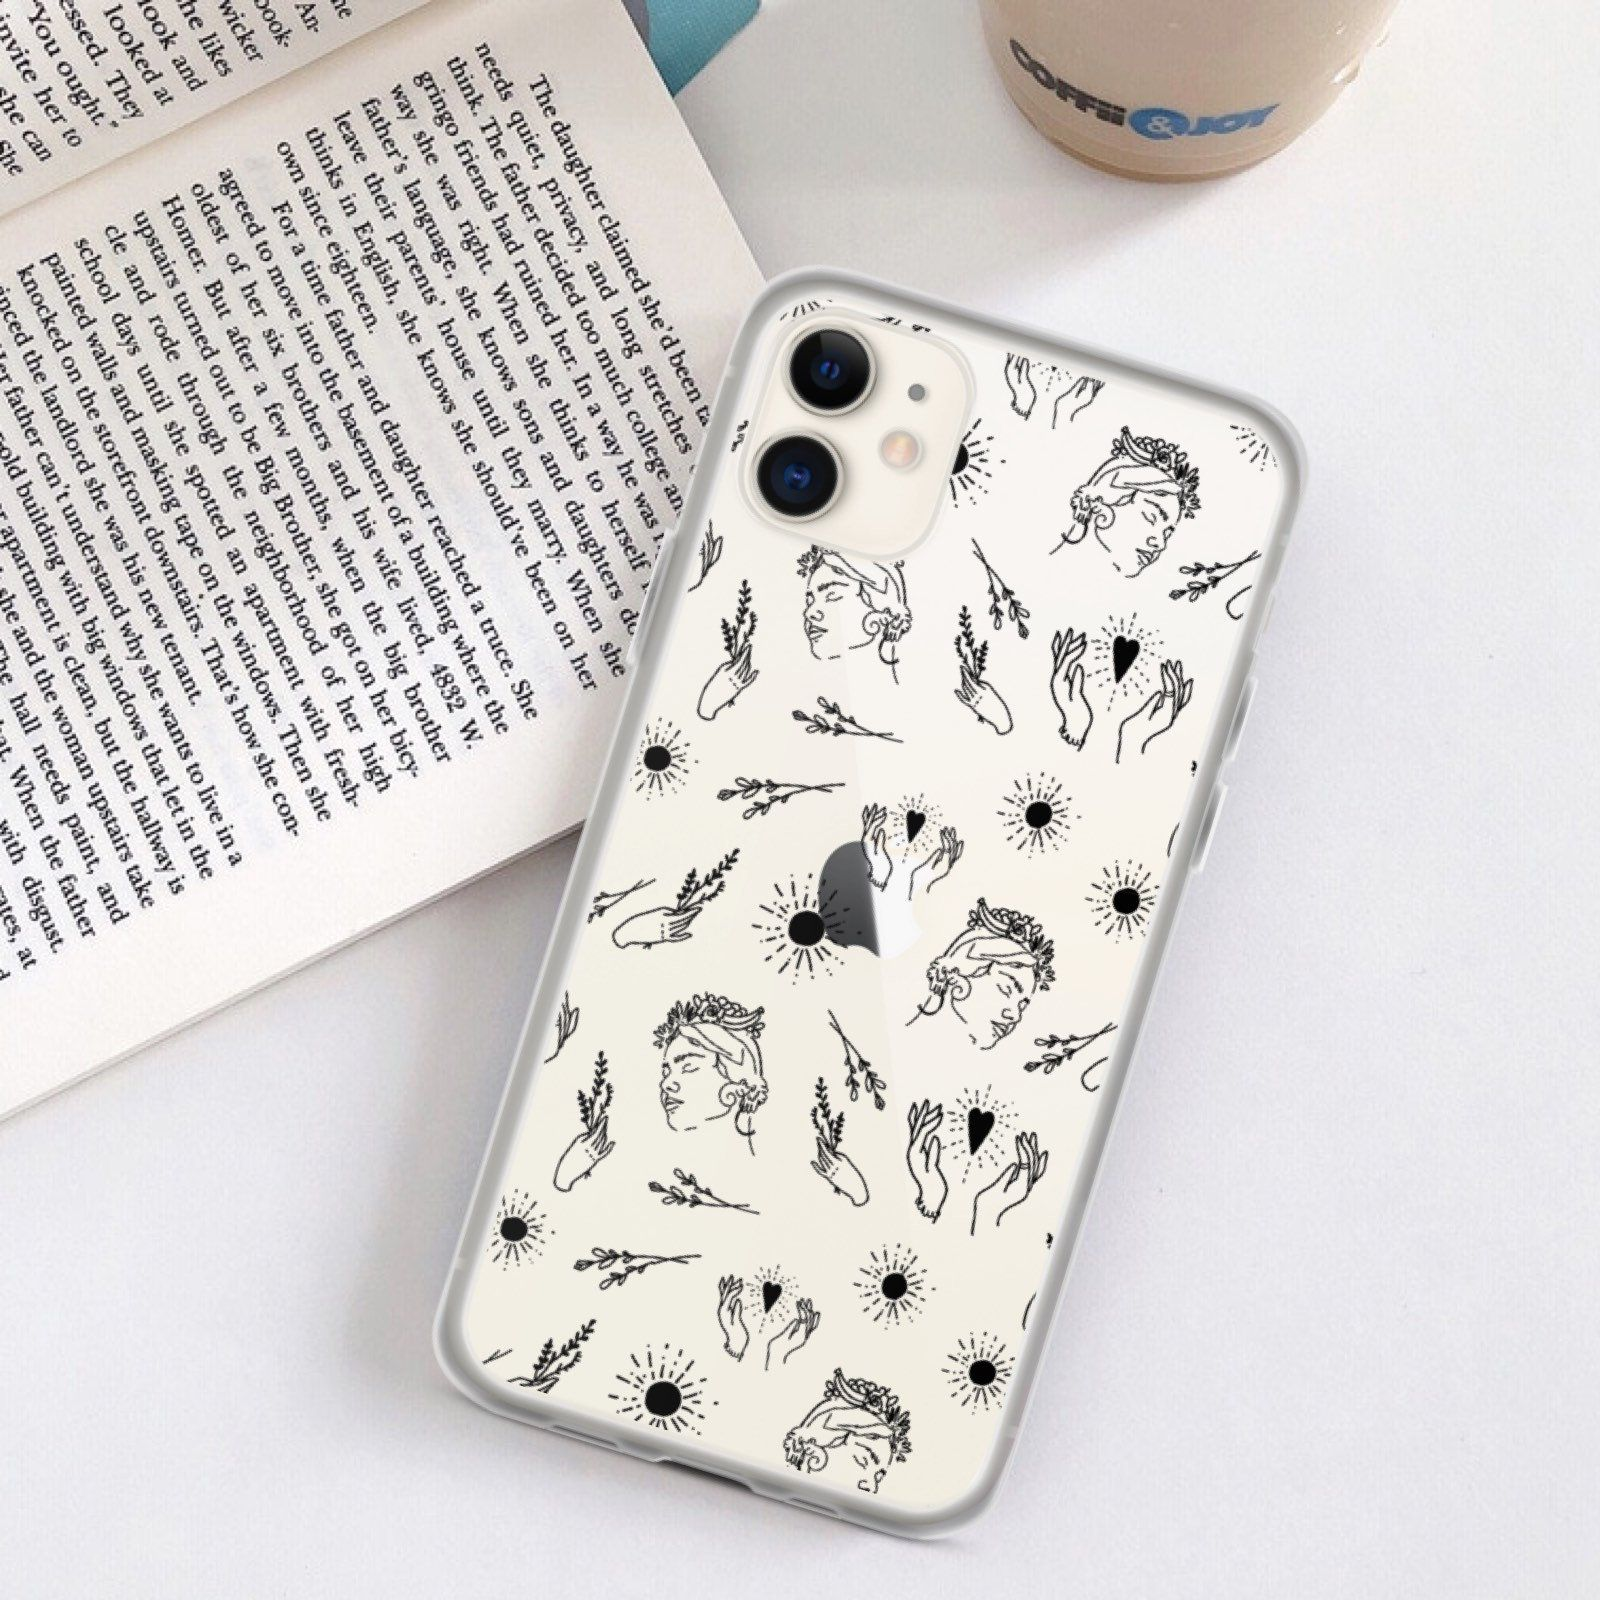 Aesthetic Iphone Cases 11